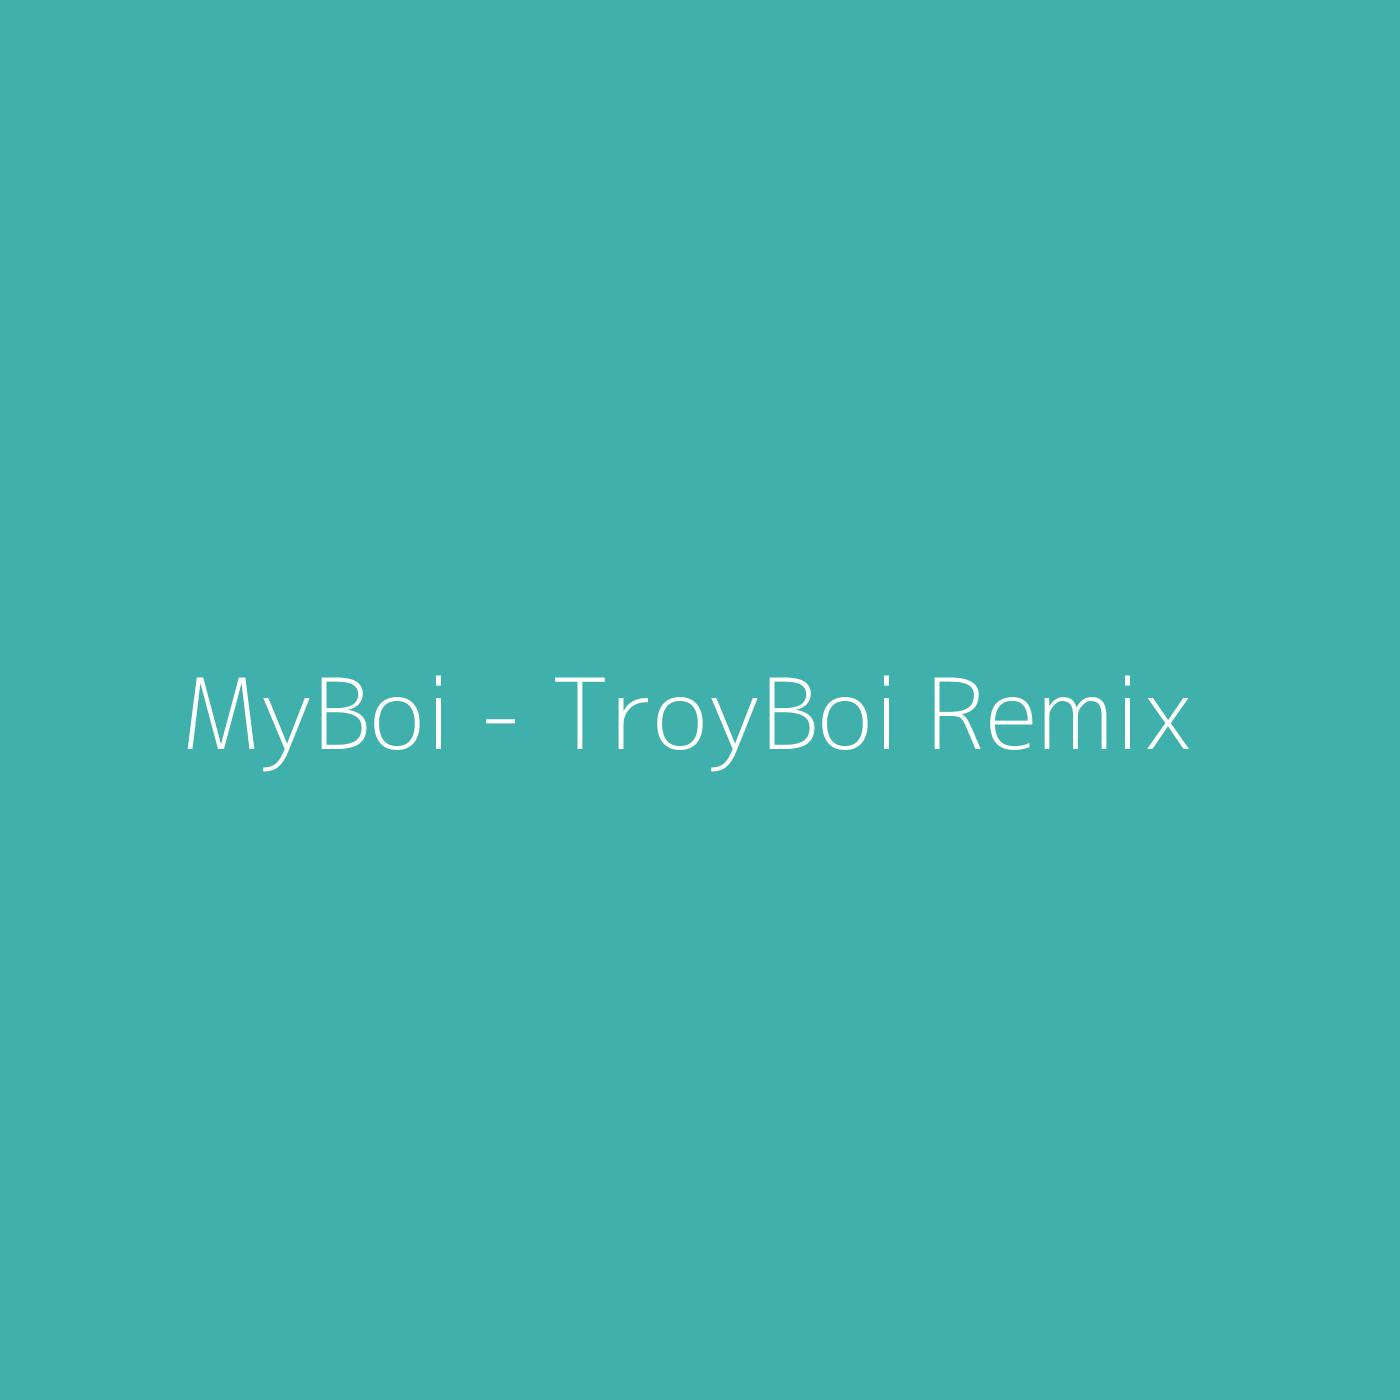 MyBoi - TroyBoi Remix – Billie Eilish